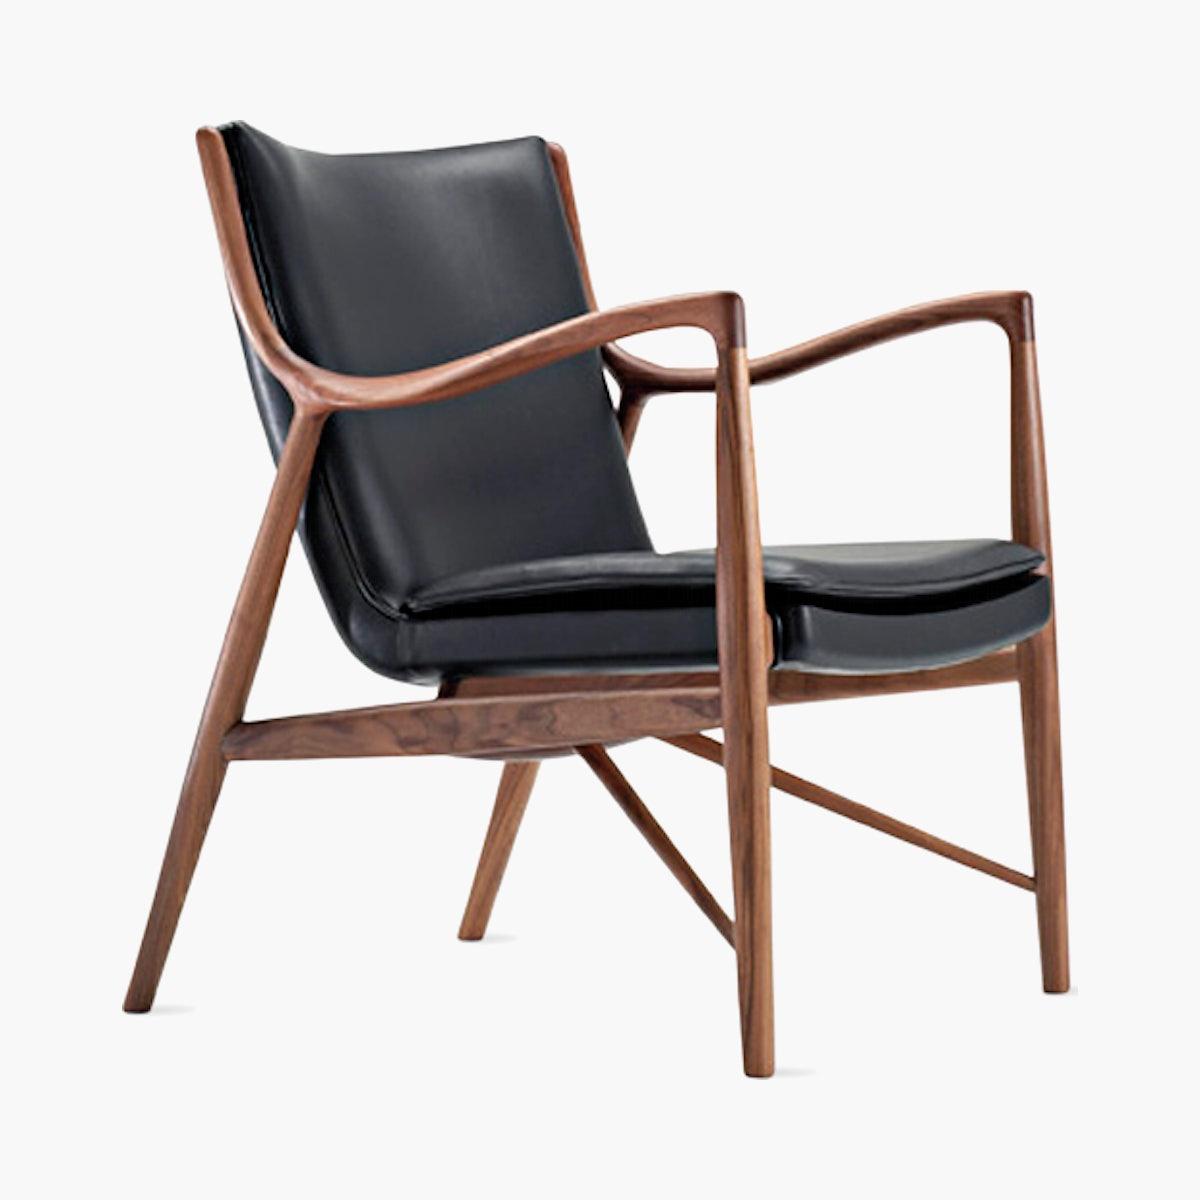 Model 45 Chair